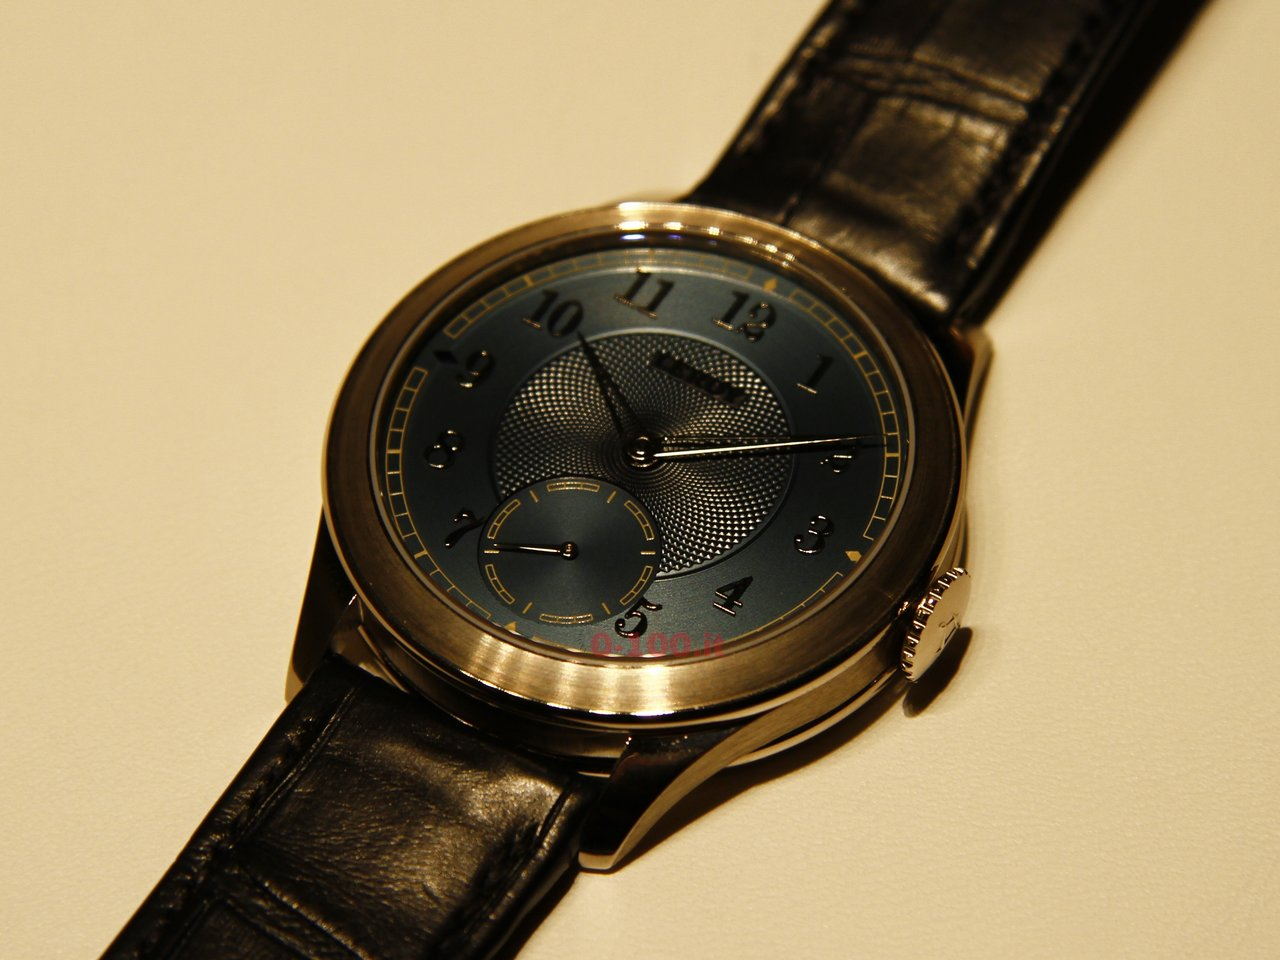 baselworld-2015_leroy-chronometer-l200-0-100-3